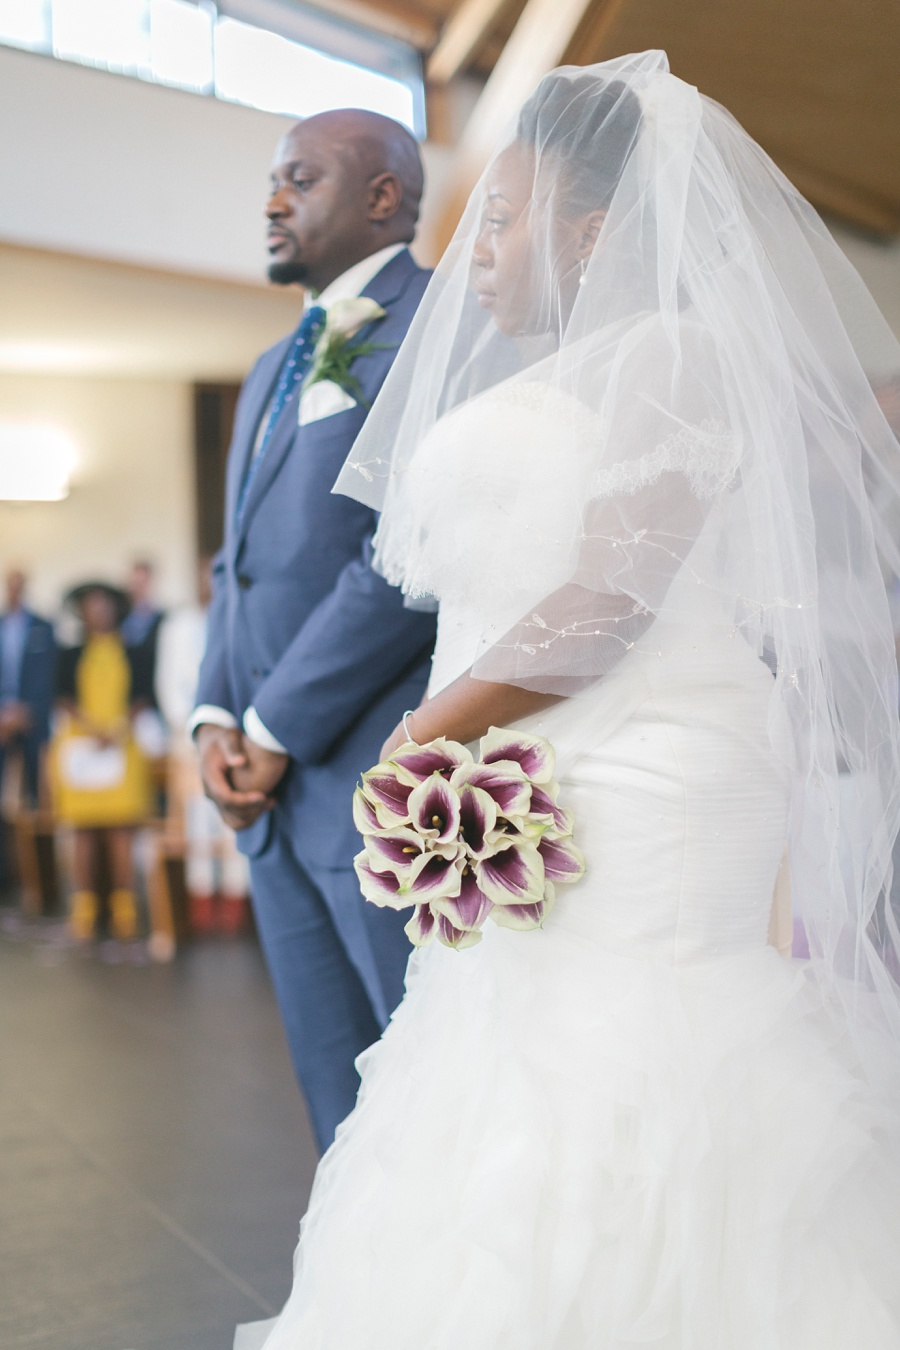 mariage_pavillon-d-armenonville-nadege-arthur-photographe-nicolas_saurin-335